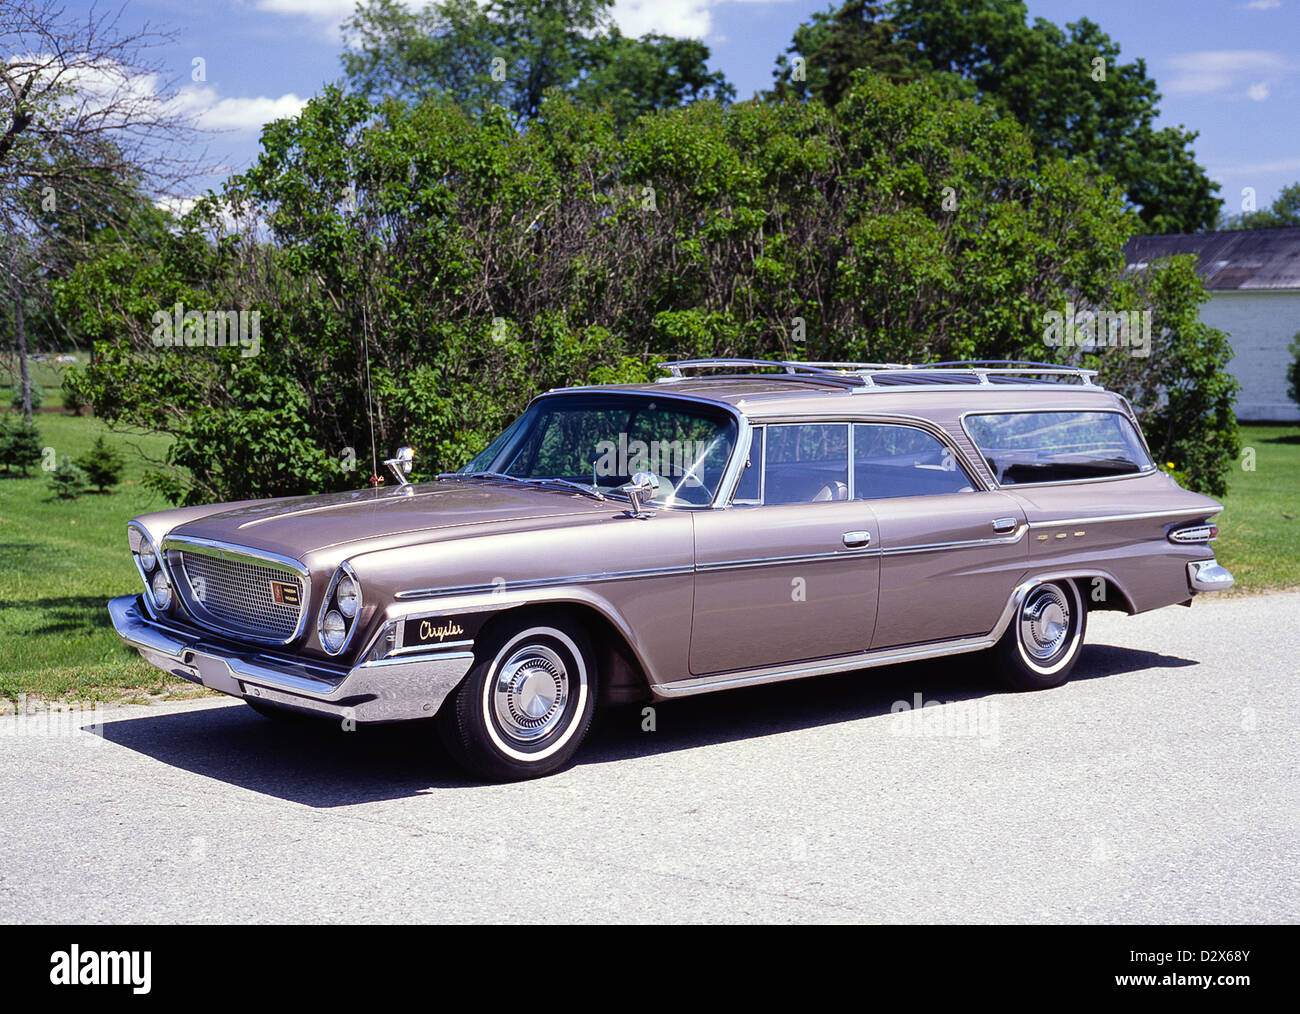 1962 chrysler station wagon